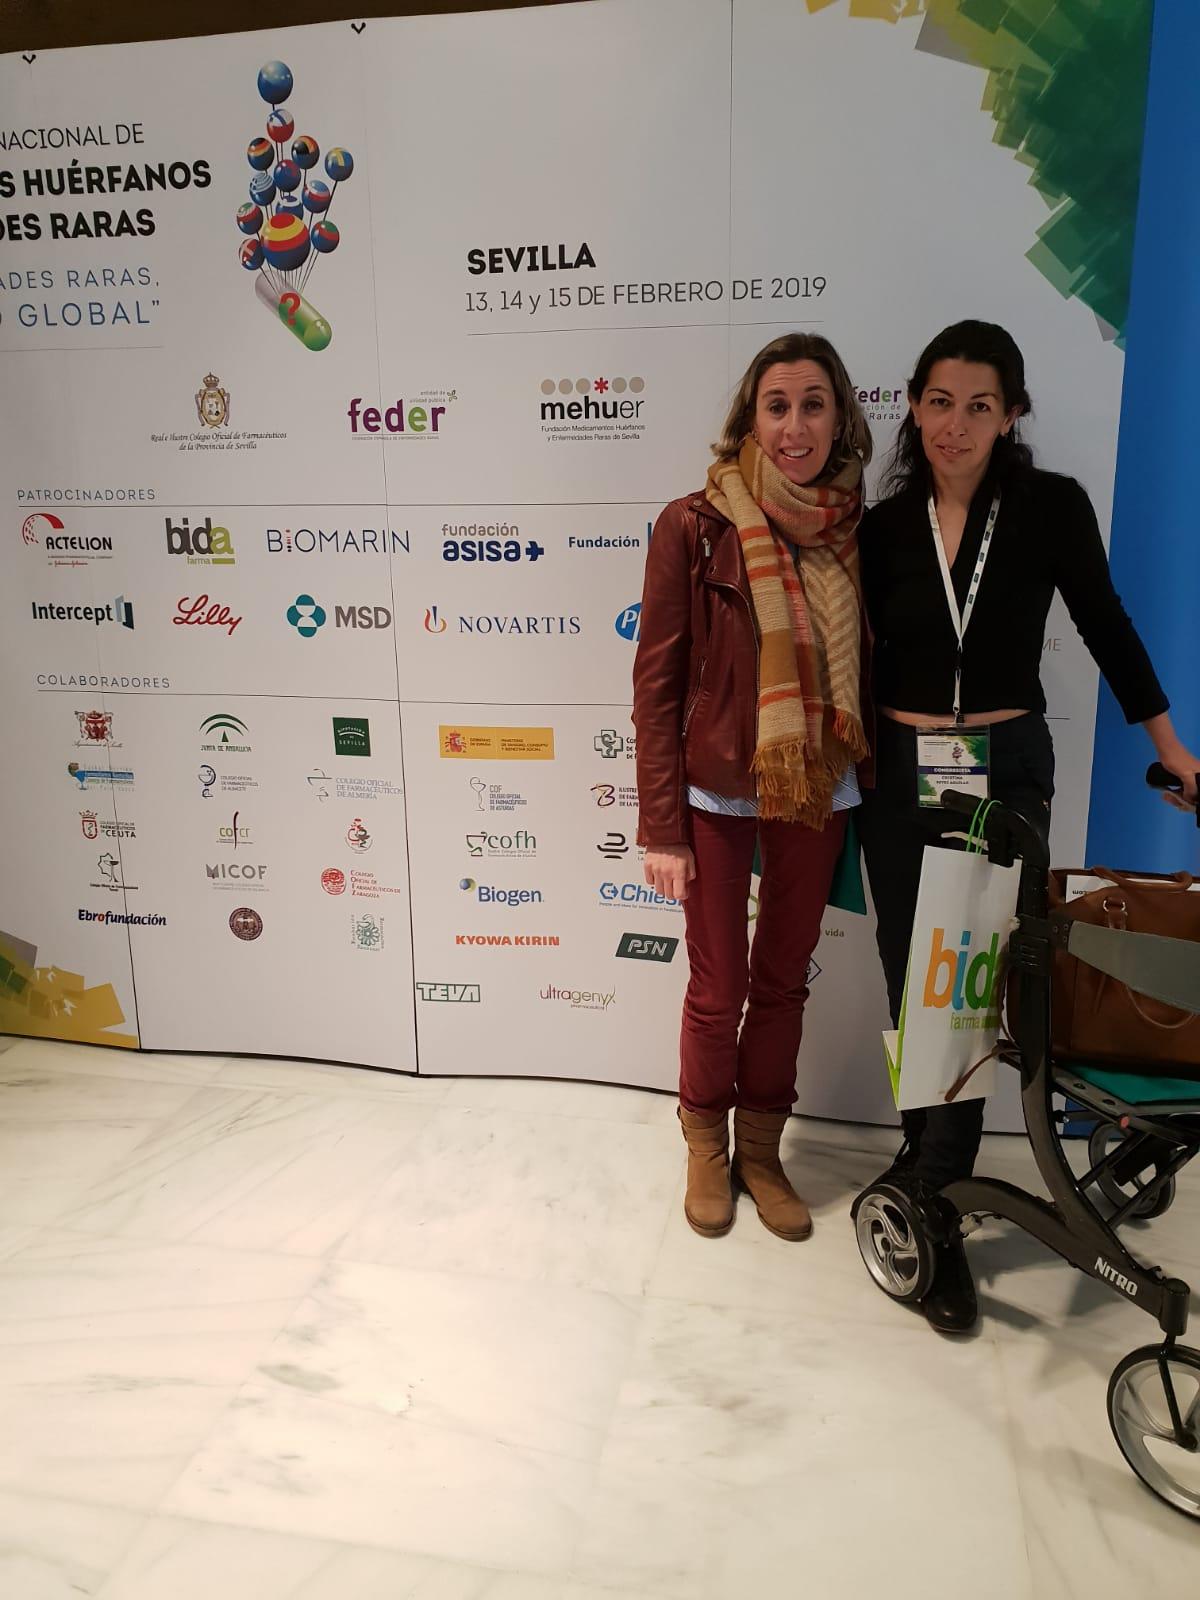 Congreso FEDER Sevilla - Febrero 2019